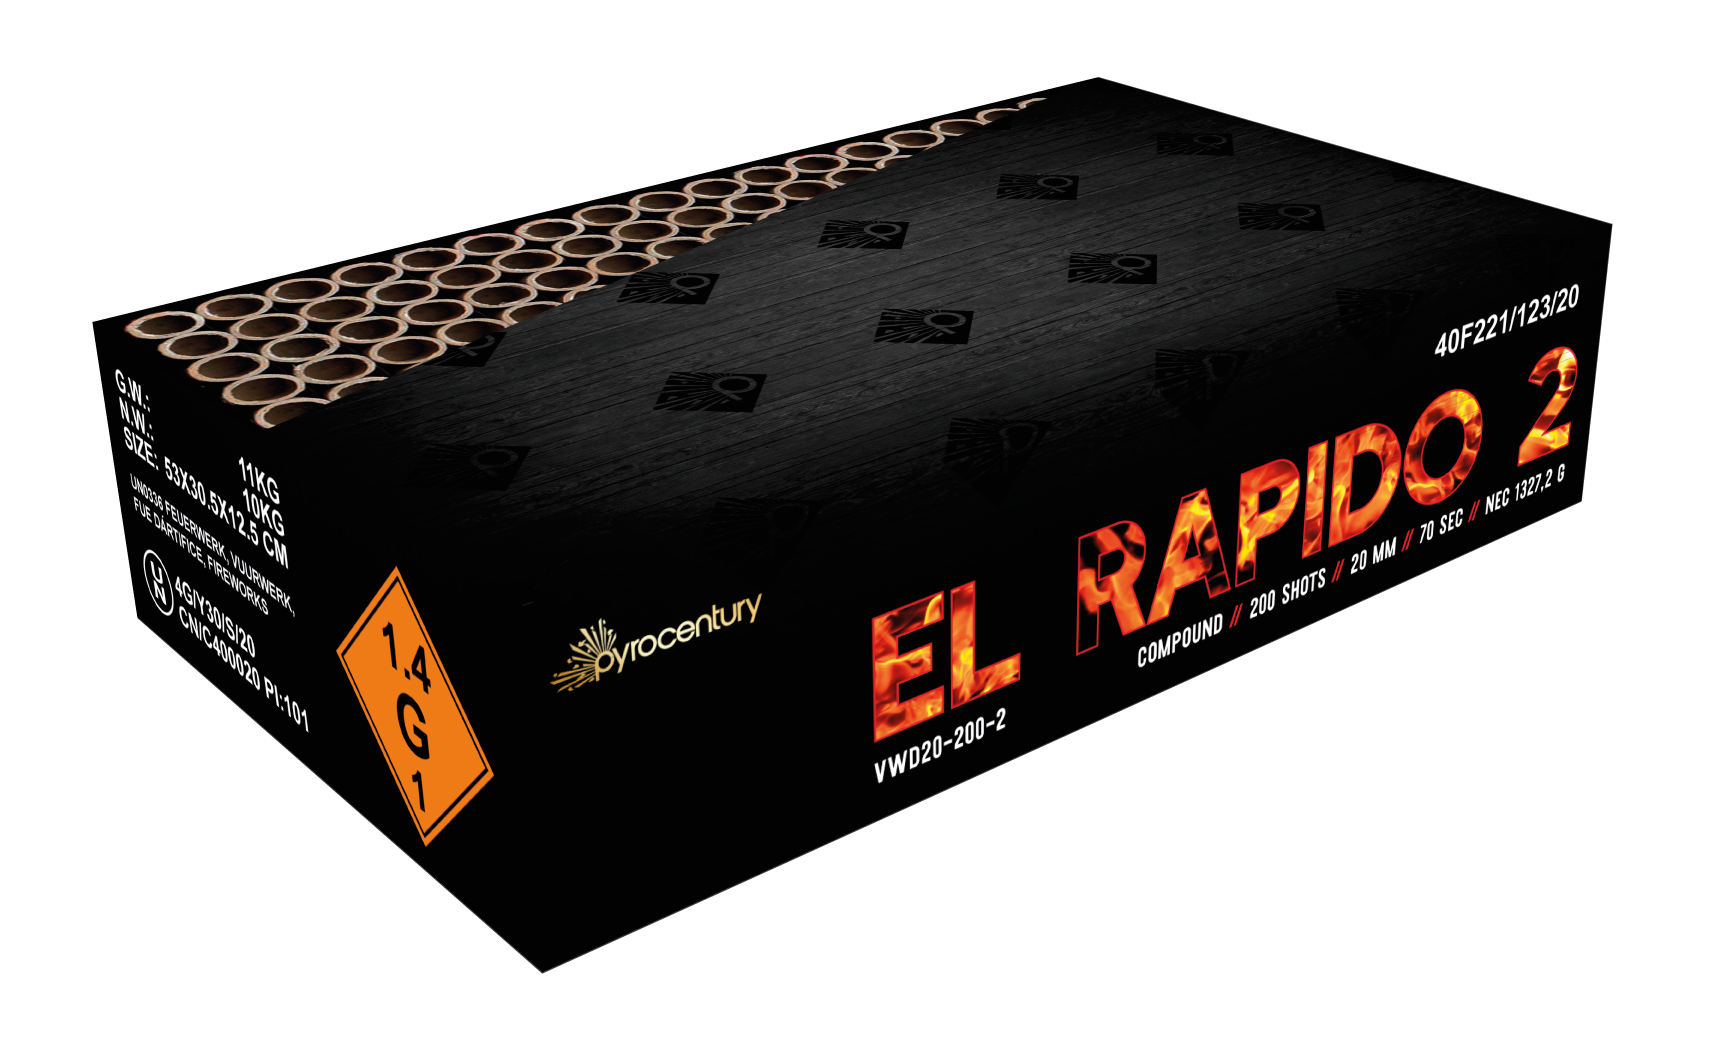 VWD El Rapido 2 – 200 Schots Compound